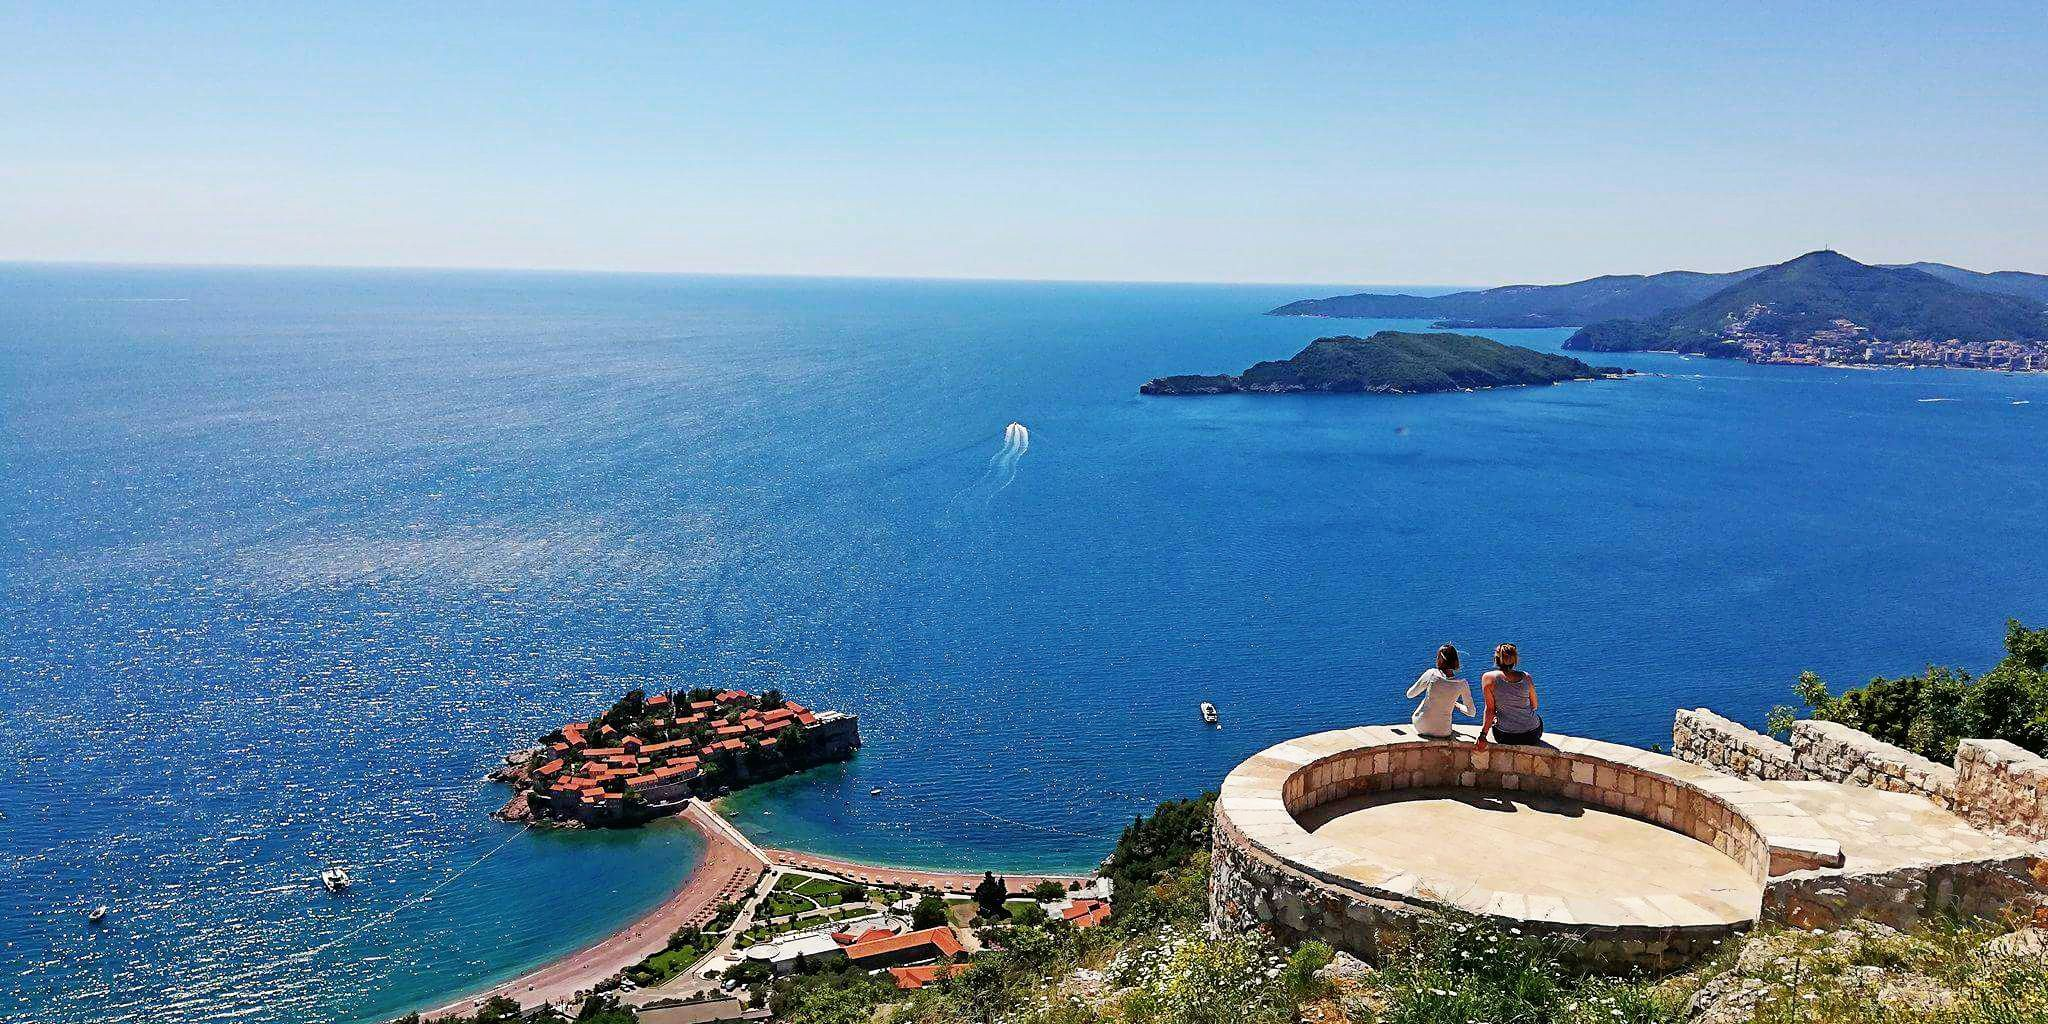 Punkt widokowy na wyspę Sveti Stefan.